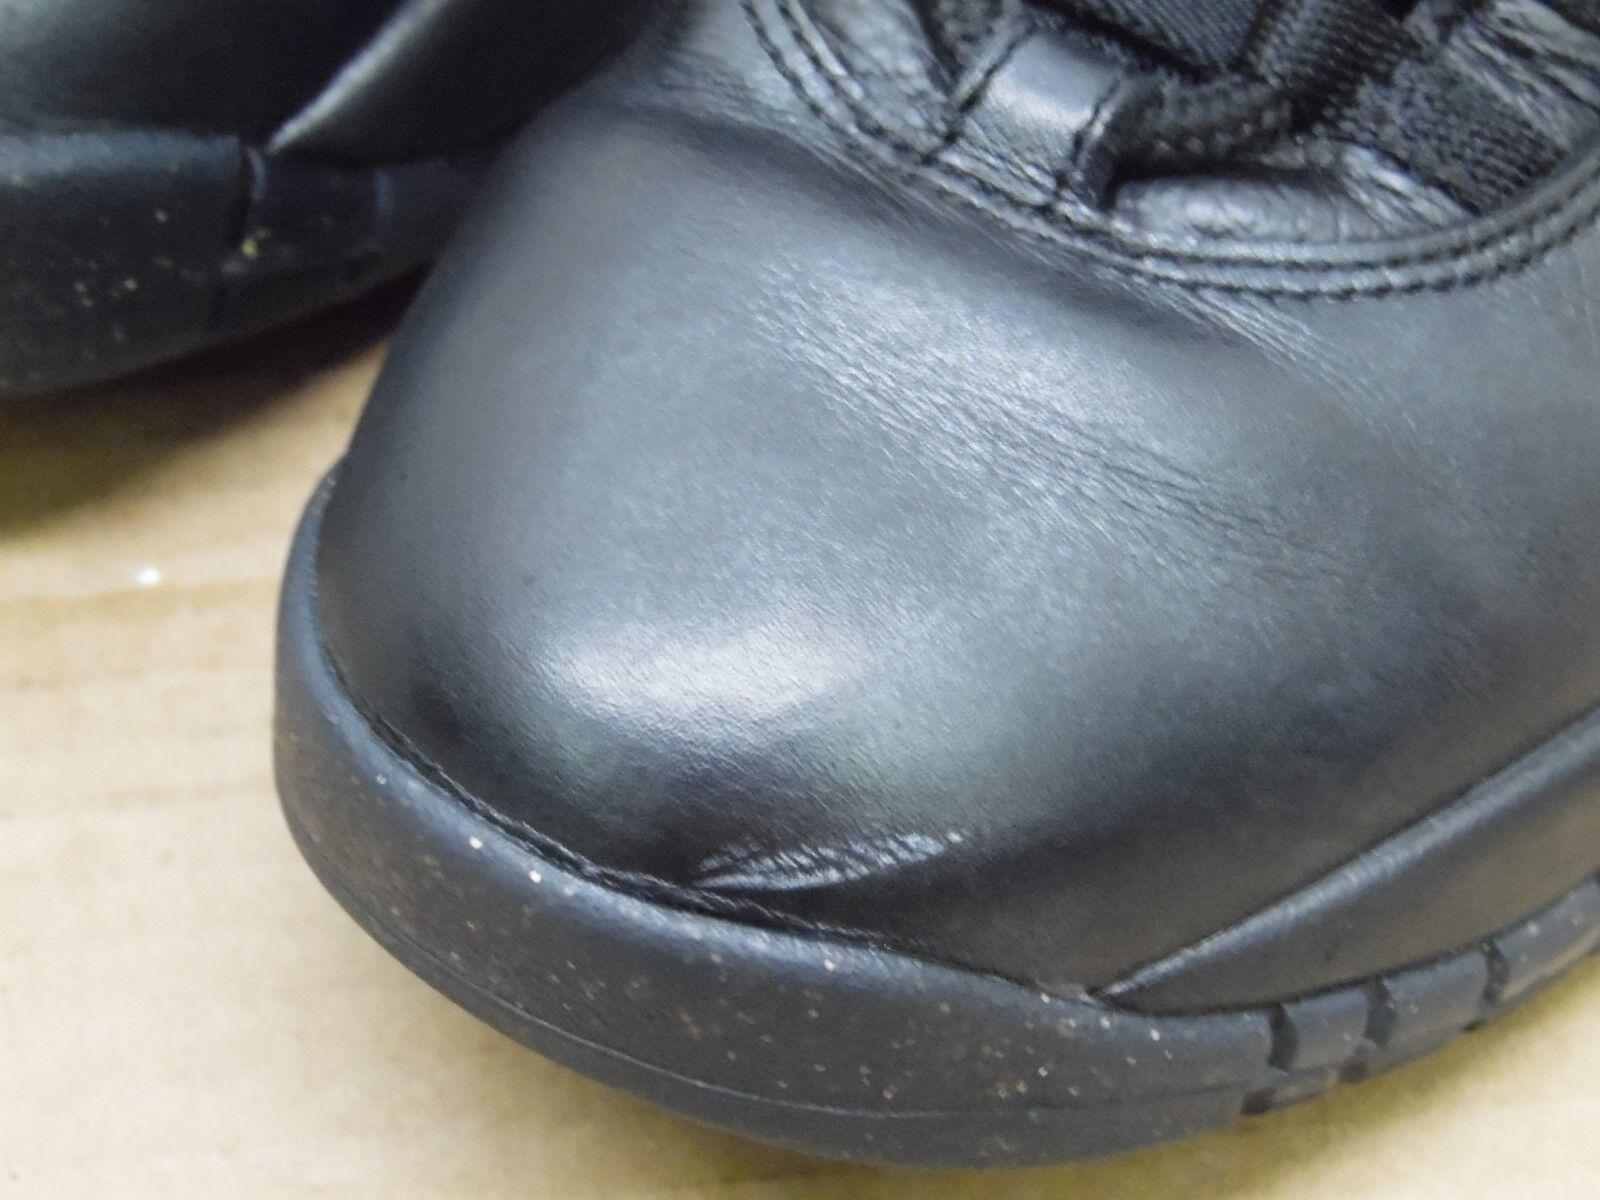 Nike Nike Nike Air Jordan Retro 10 NYC mens size 8.5 310805-012 cbadf8